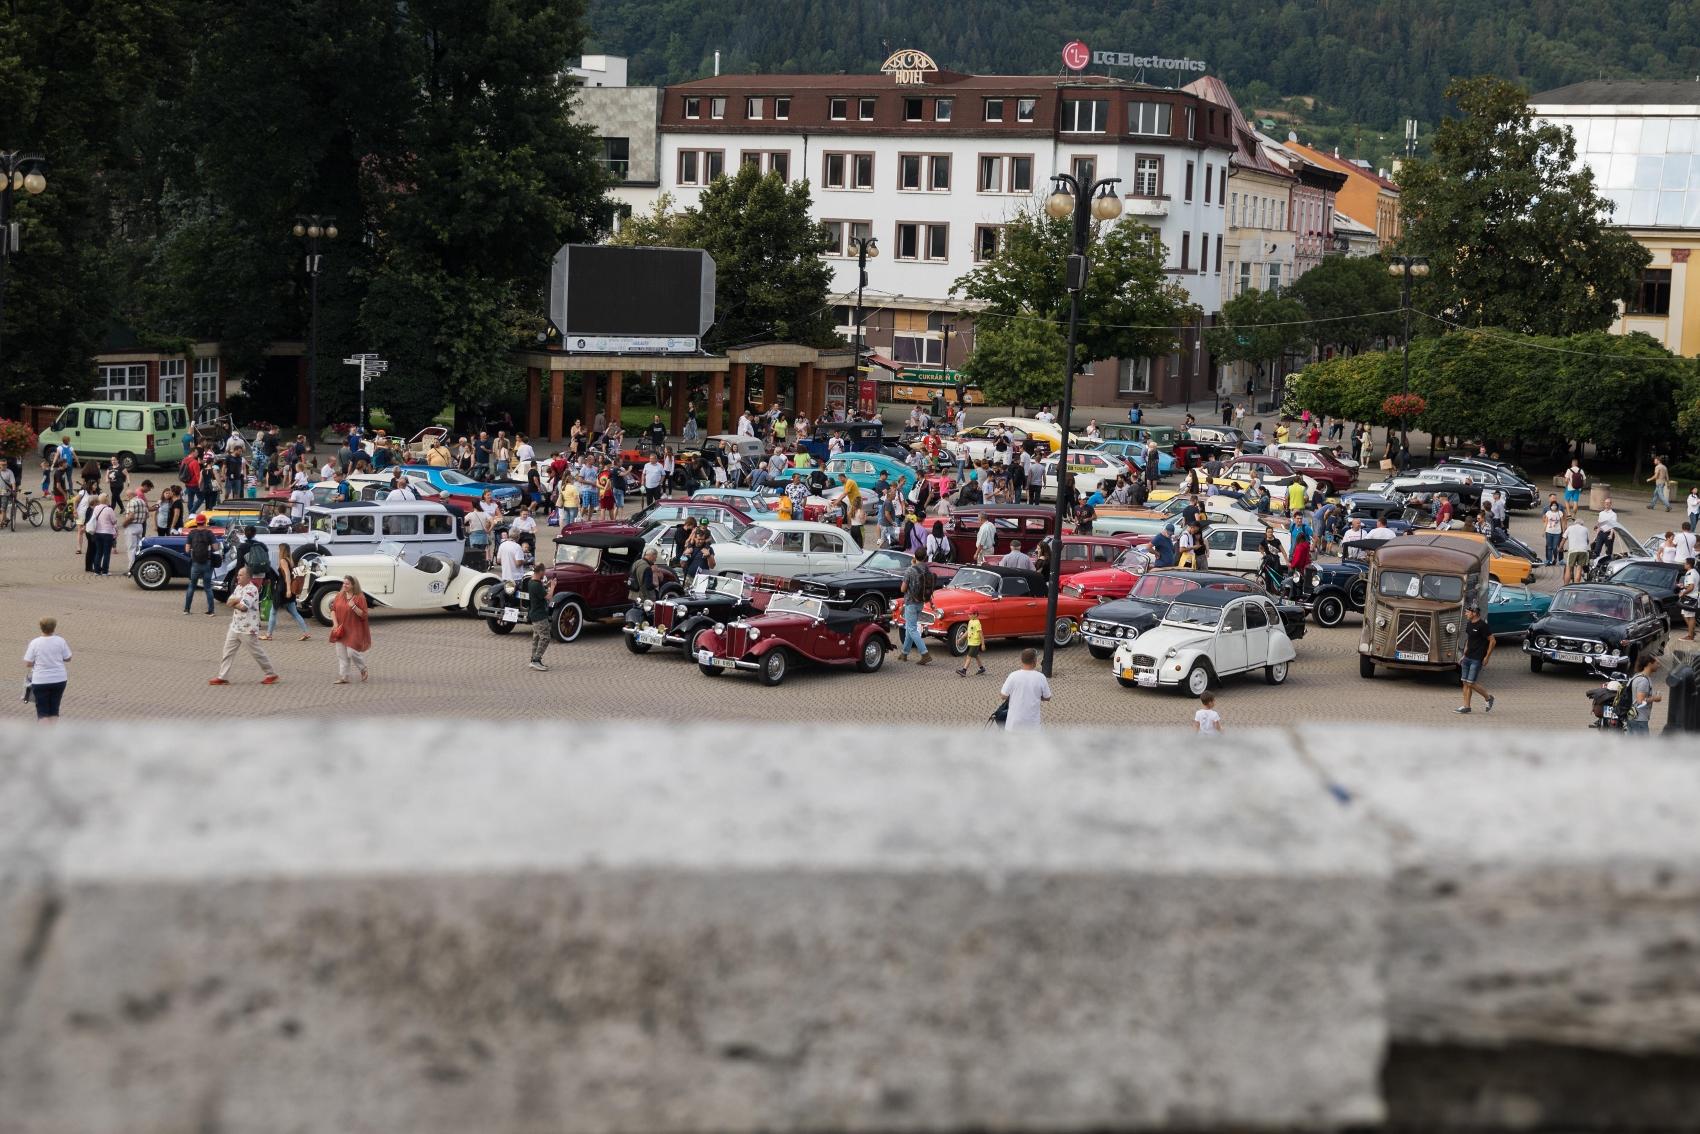 Pozrite si galériu z podujatia Beskyd Rallye – memoriál Ladislava Dlhopolčeka 2020 IyN88451Qo turzov